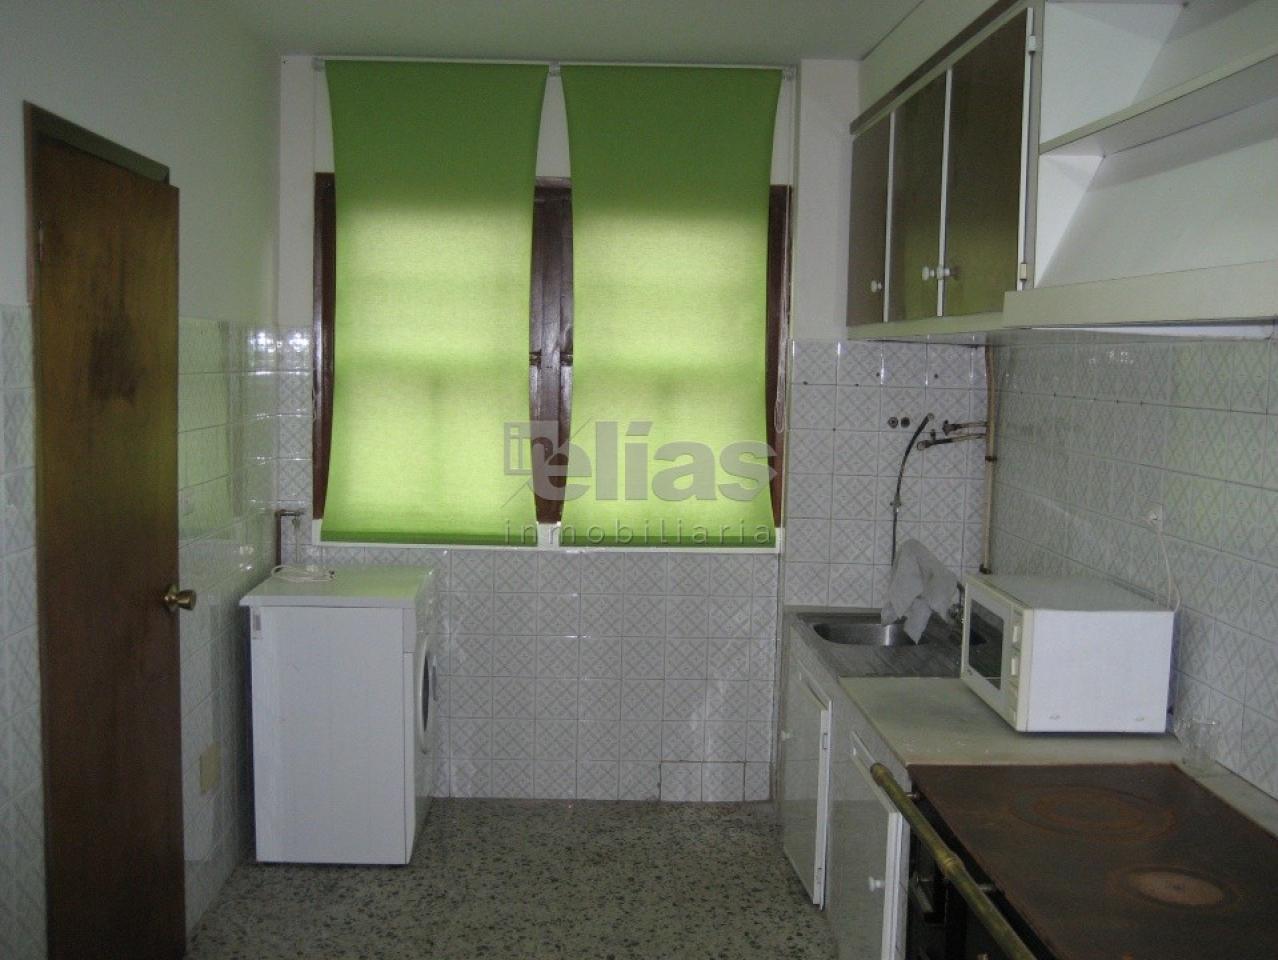 Casa en venta en Bamiro – C000013